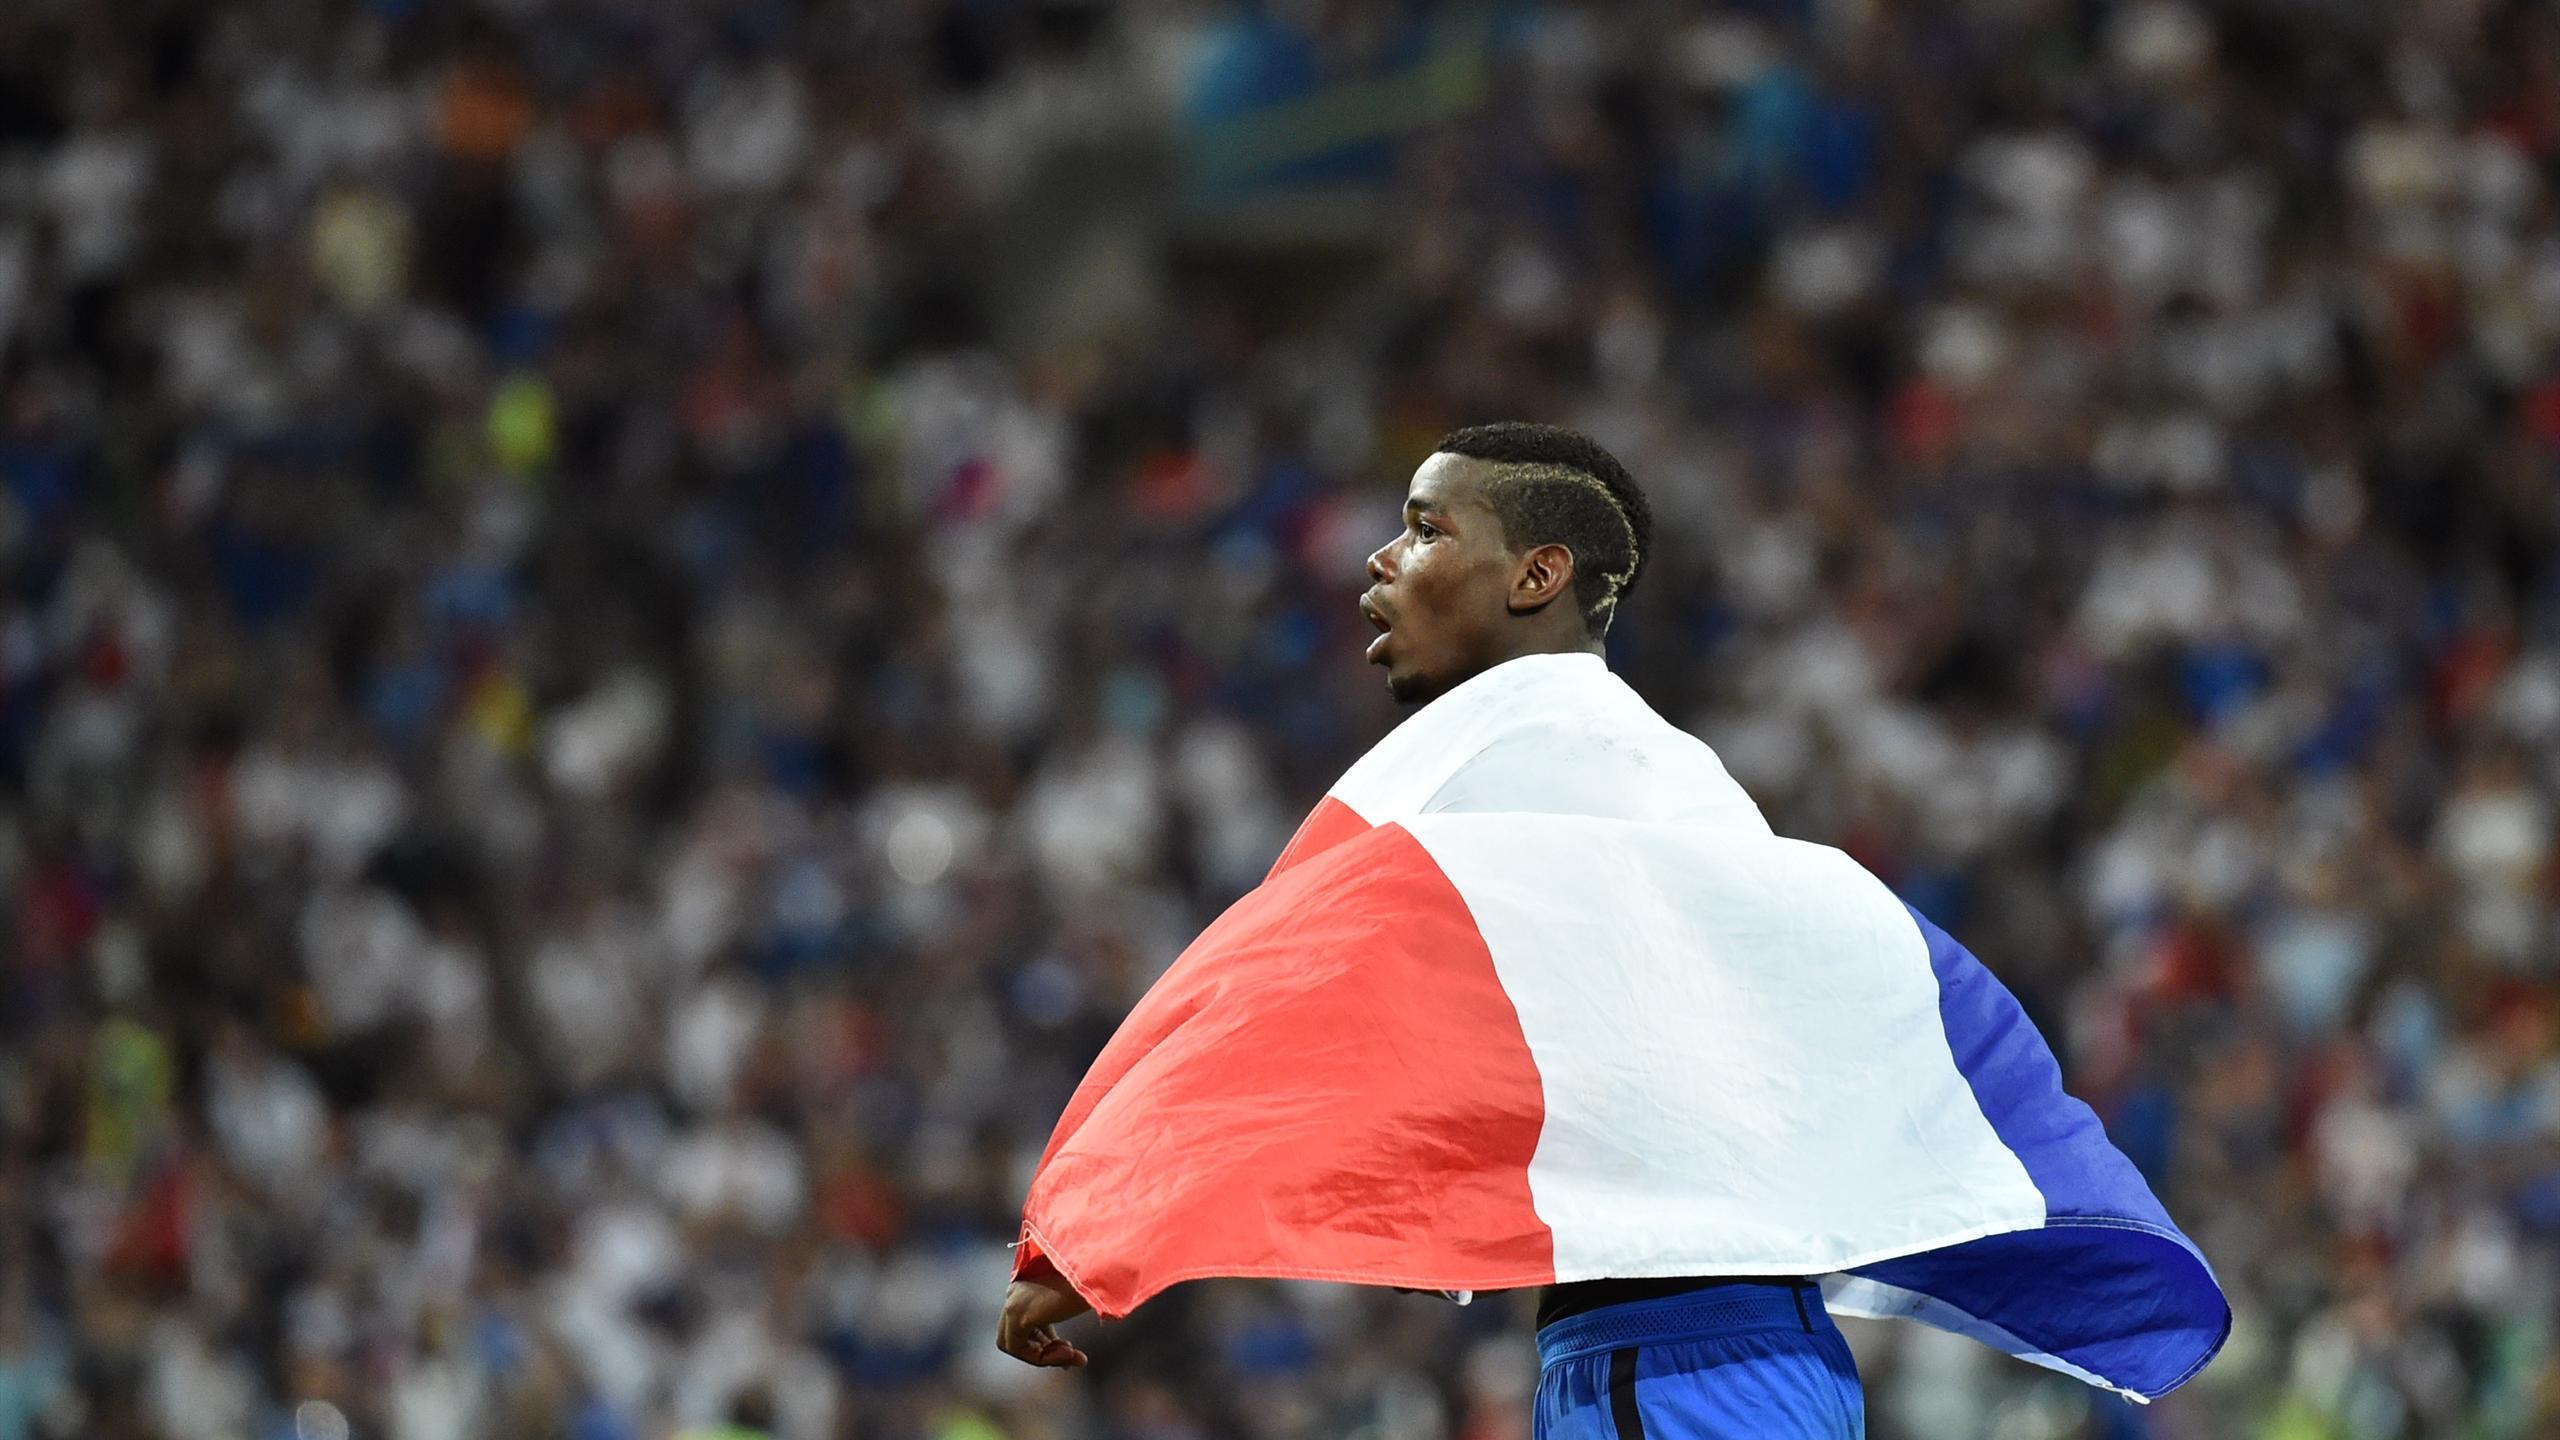 Paul Pogba (France)